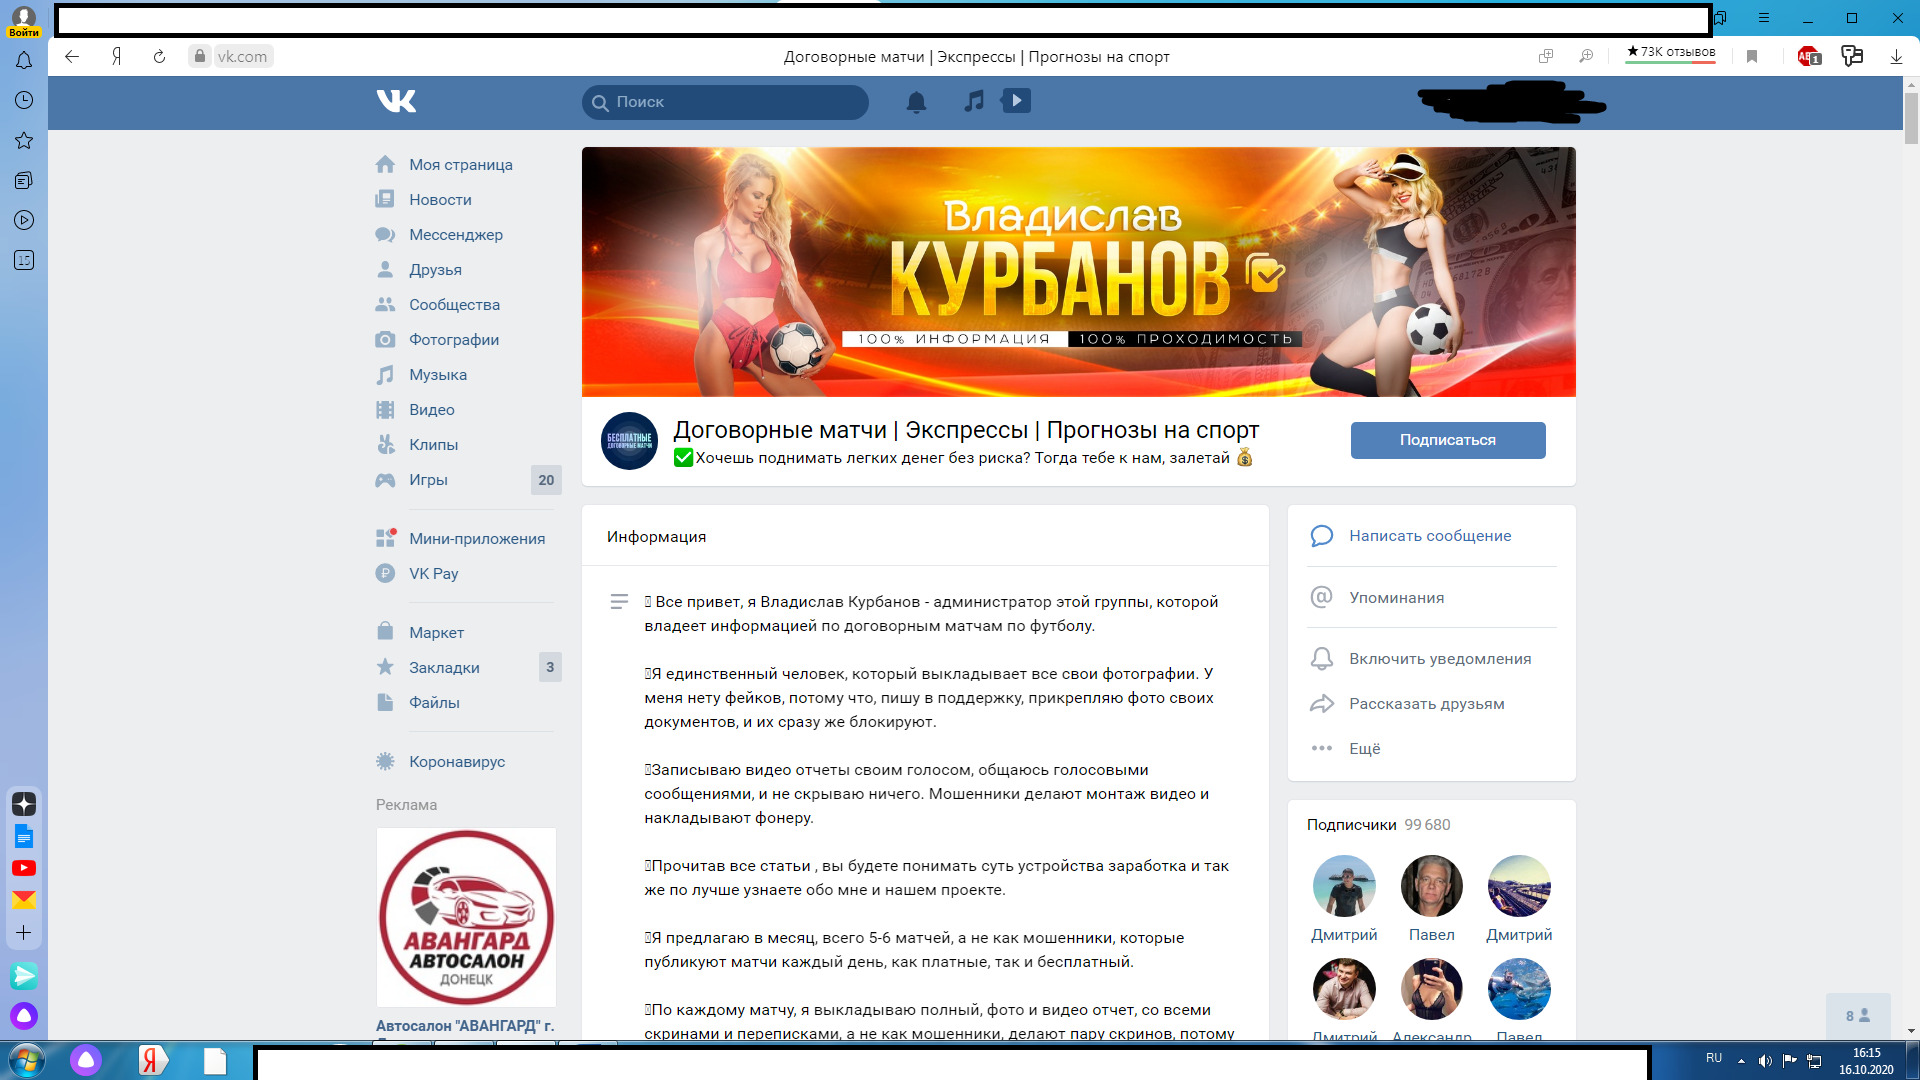 Личная страничка Владислава Курбанова «ВКонтакте»